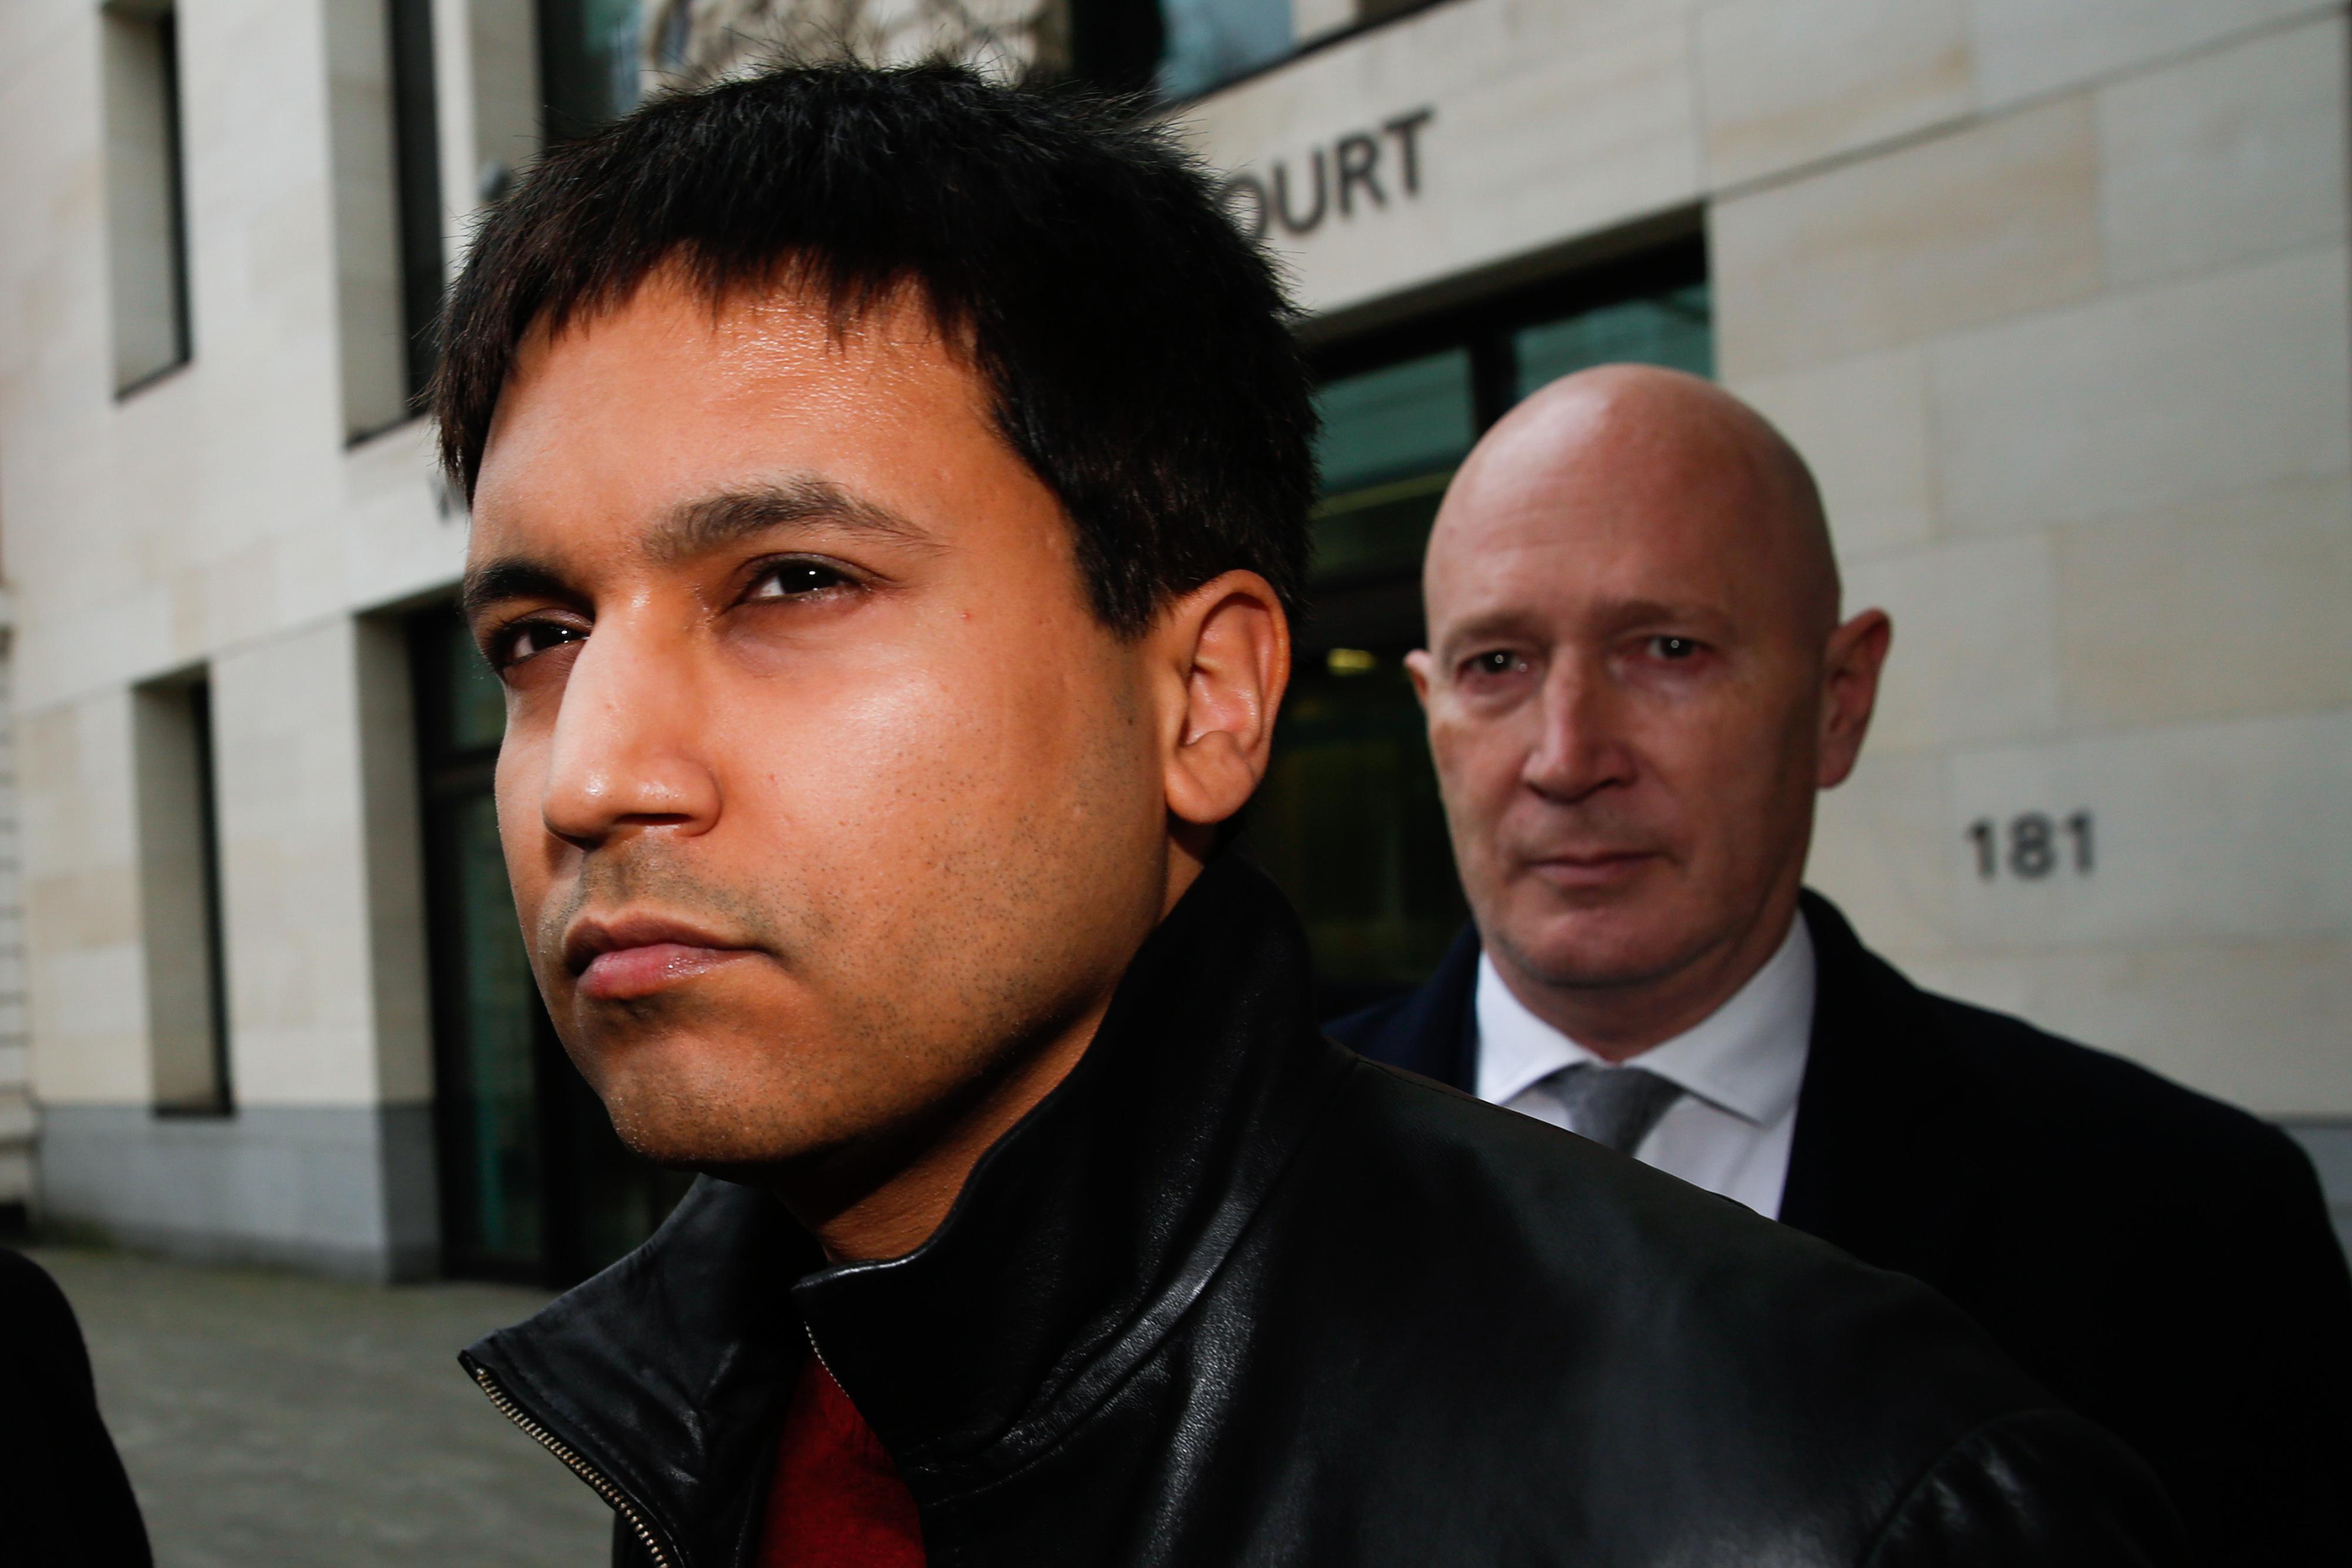 Pursuing Flash Crash Trader Navinder Singh Sarao At Extradition Hearing